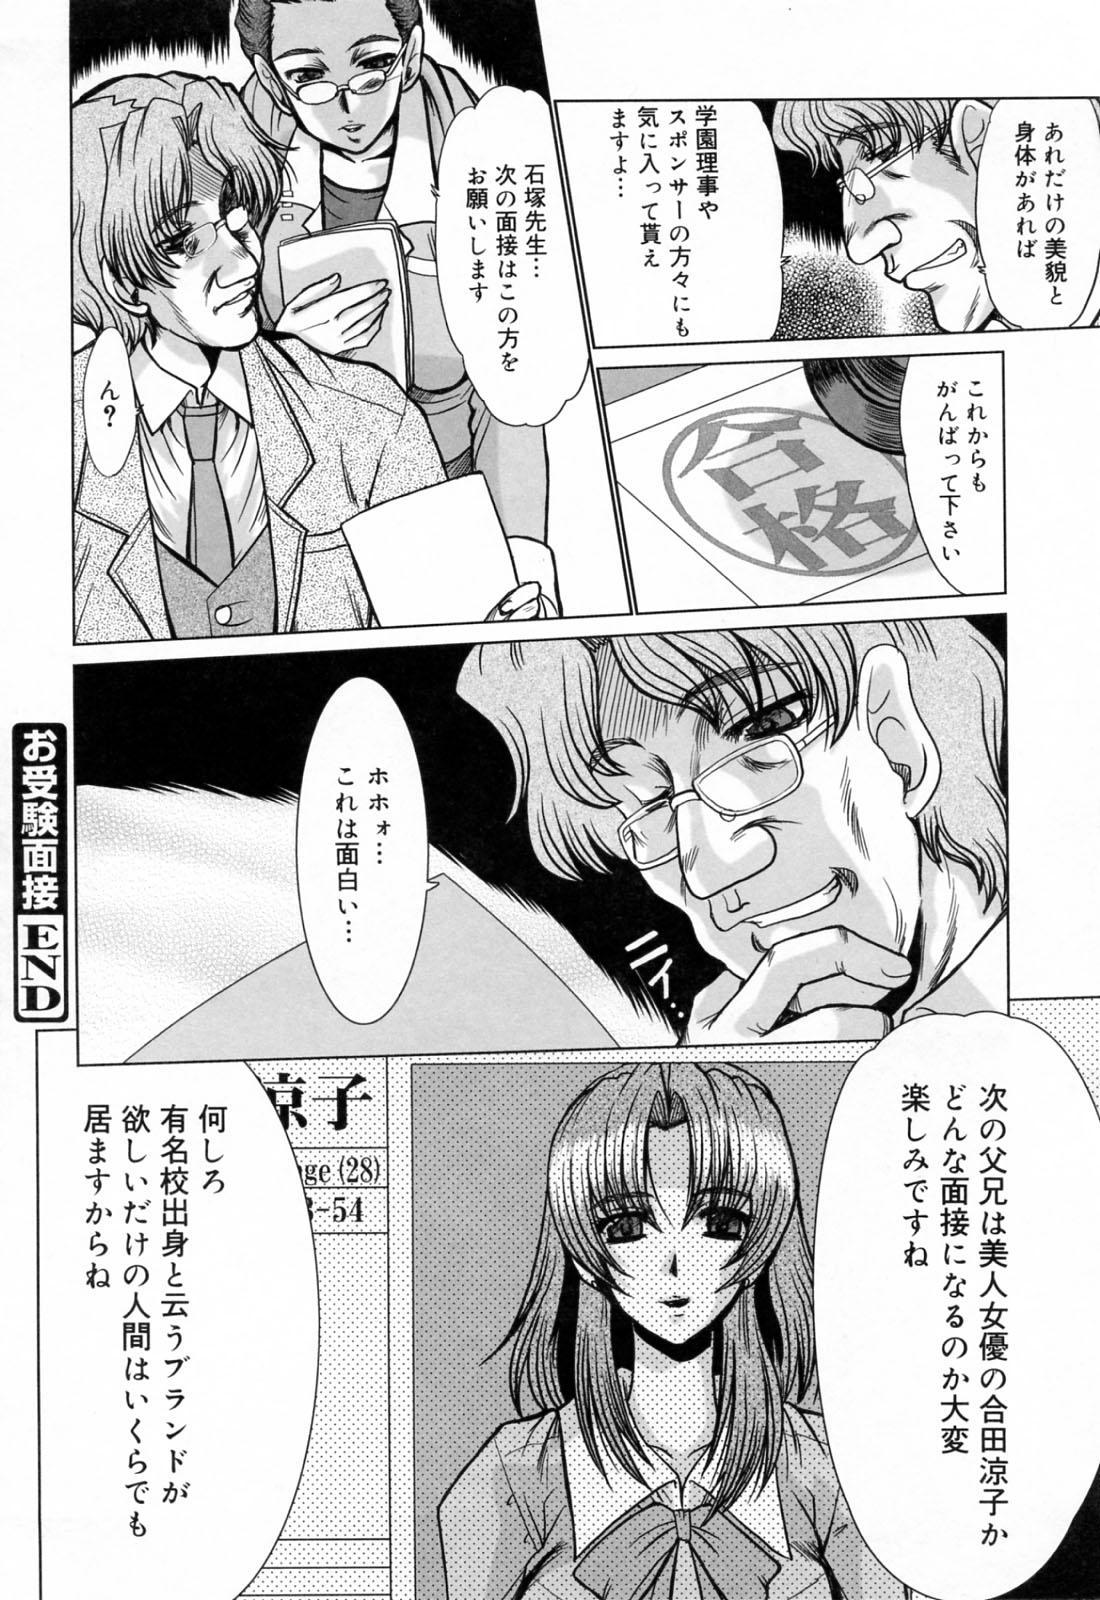 Kanjuku Hitozuma Nikki - The diary of the mature married woman 151